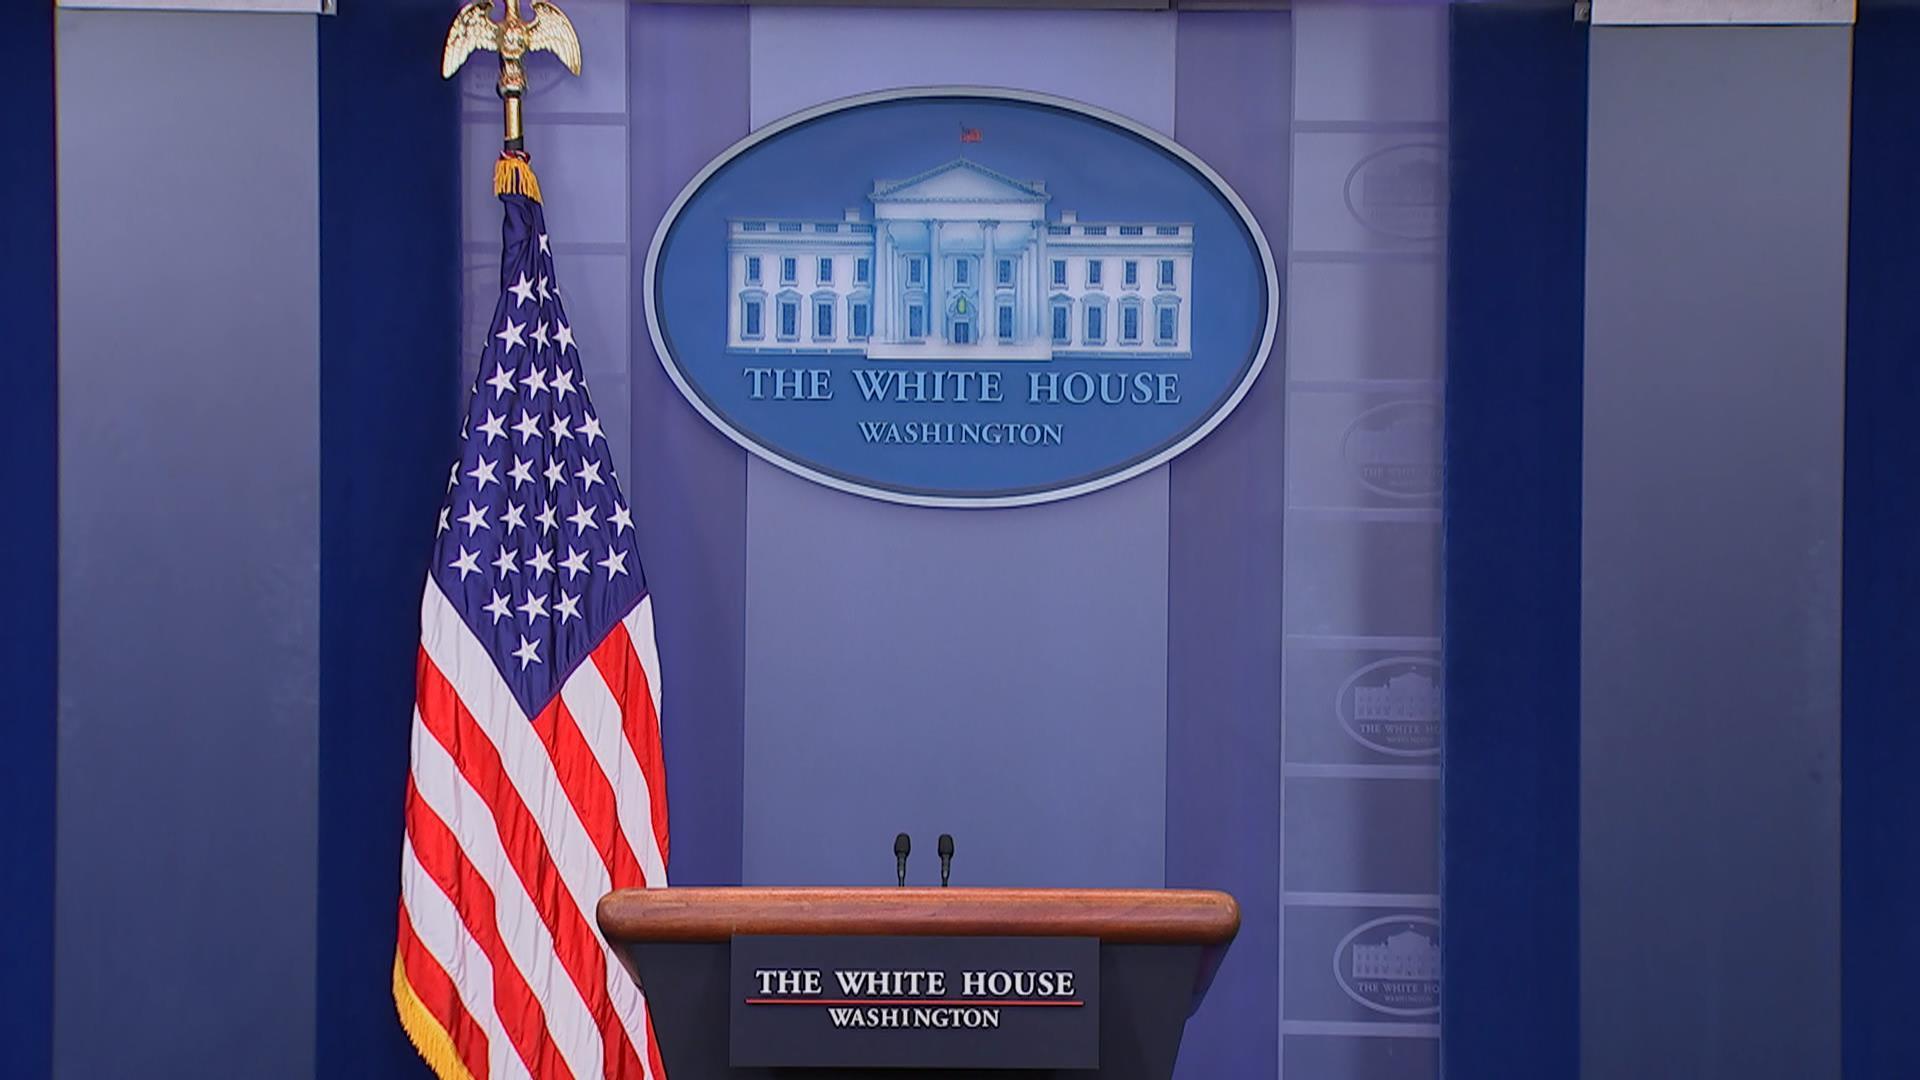 White House War Room Photo